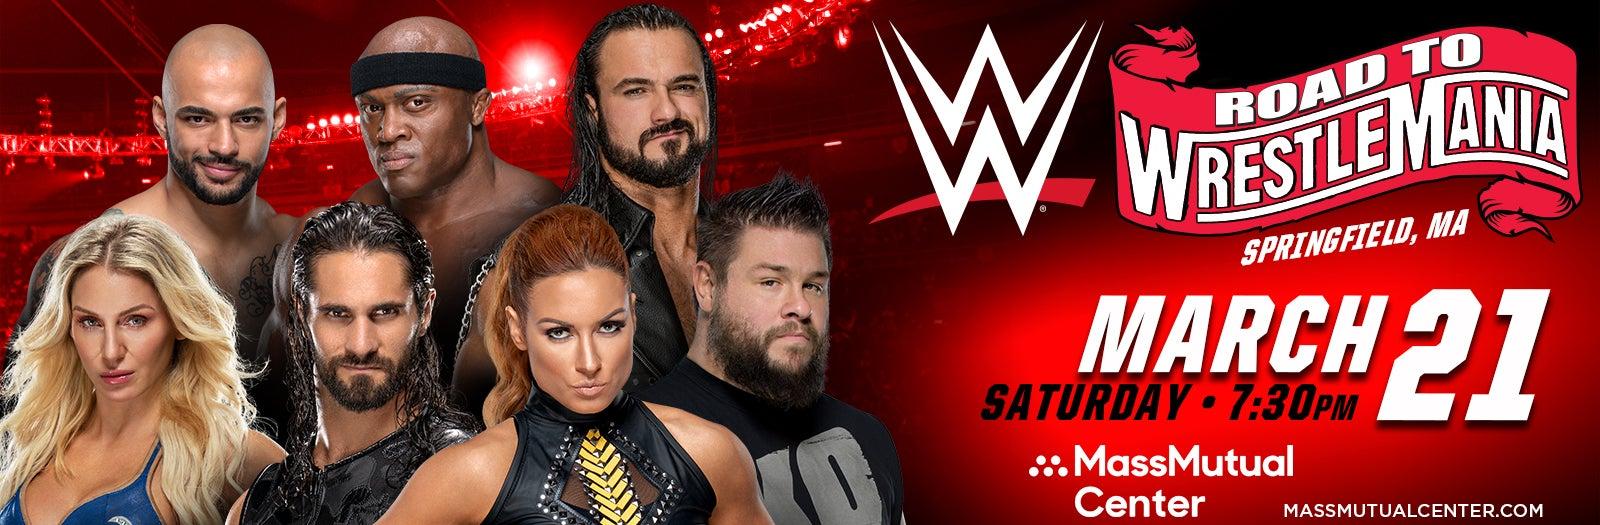 Rescheduled - WWE Road to Wrestlemania